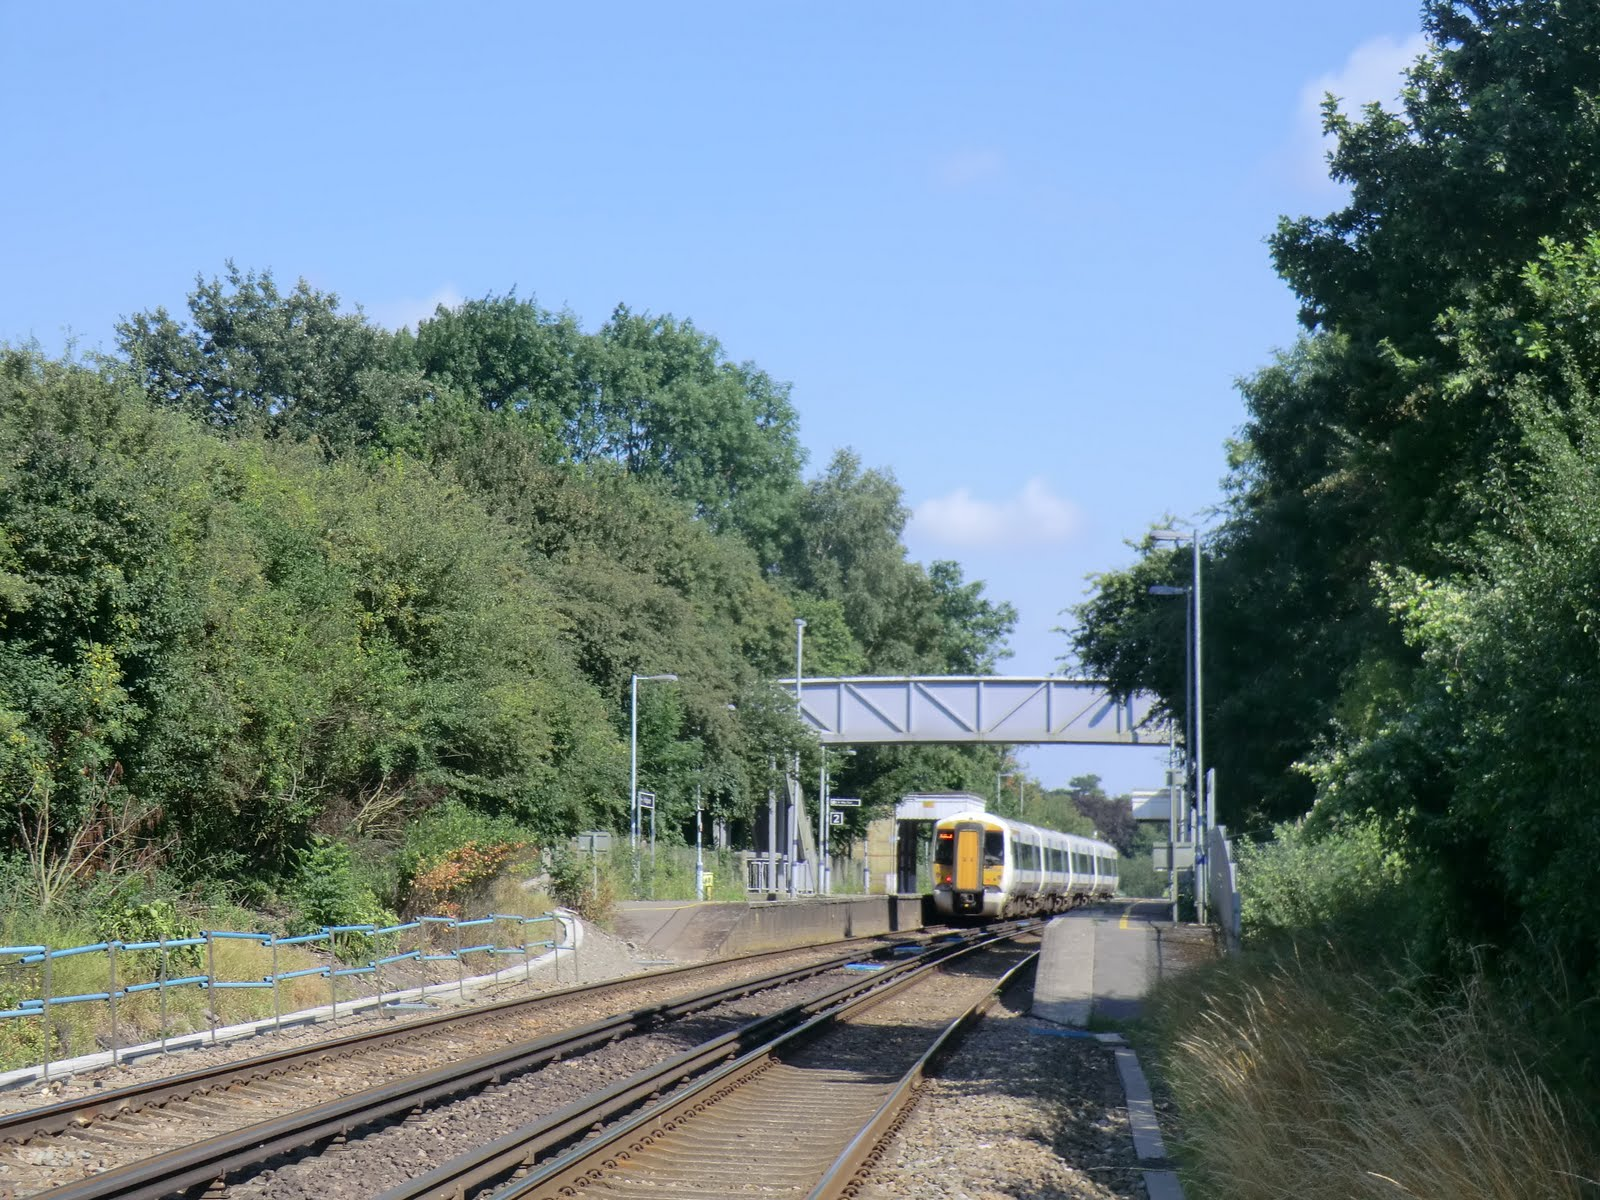 CIMG3208 Hollingbourne station